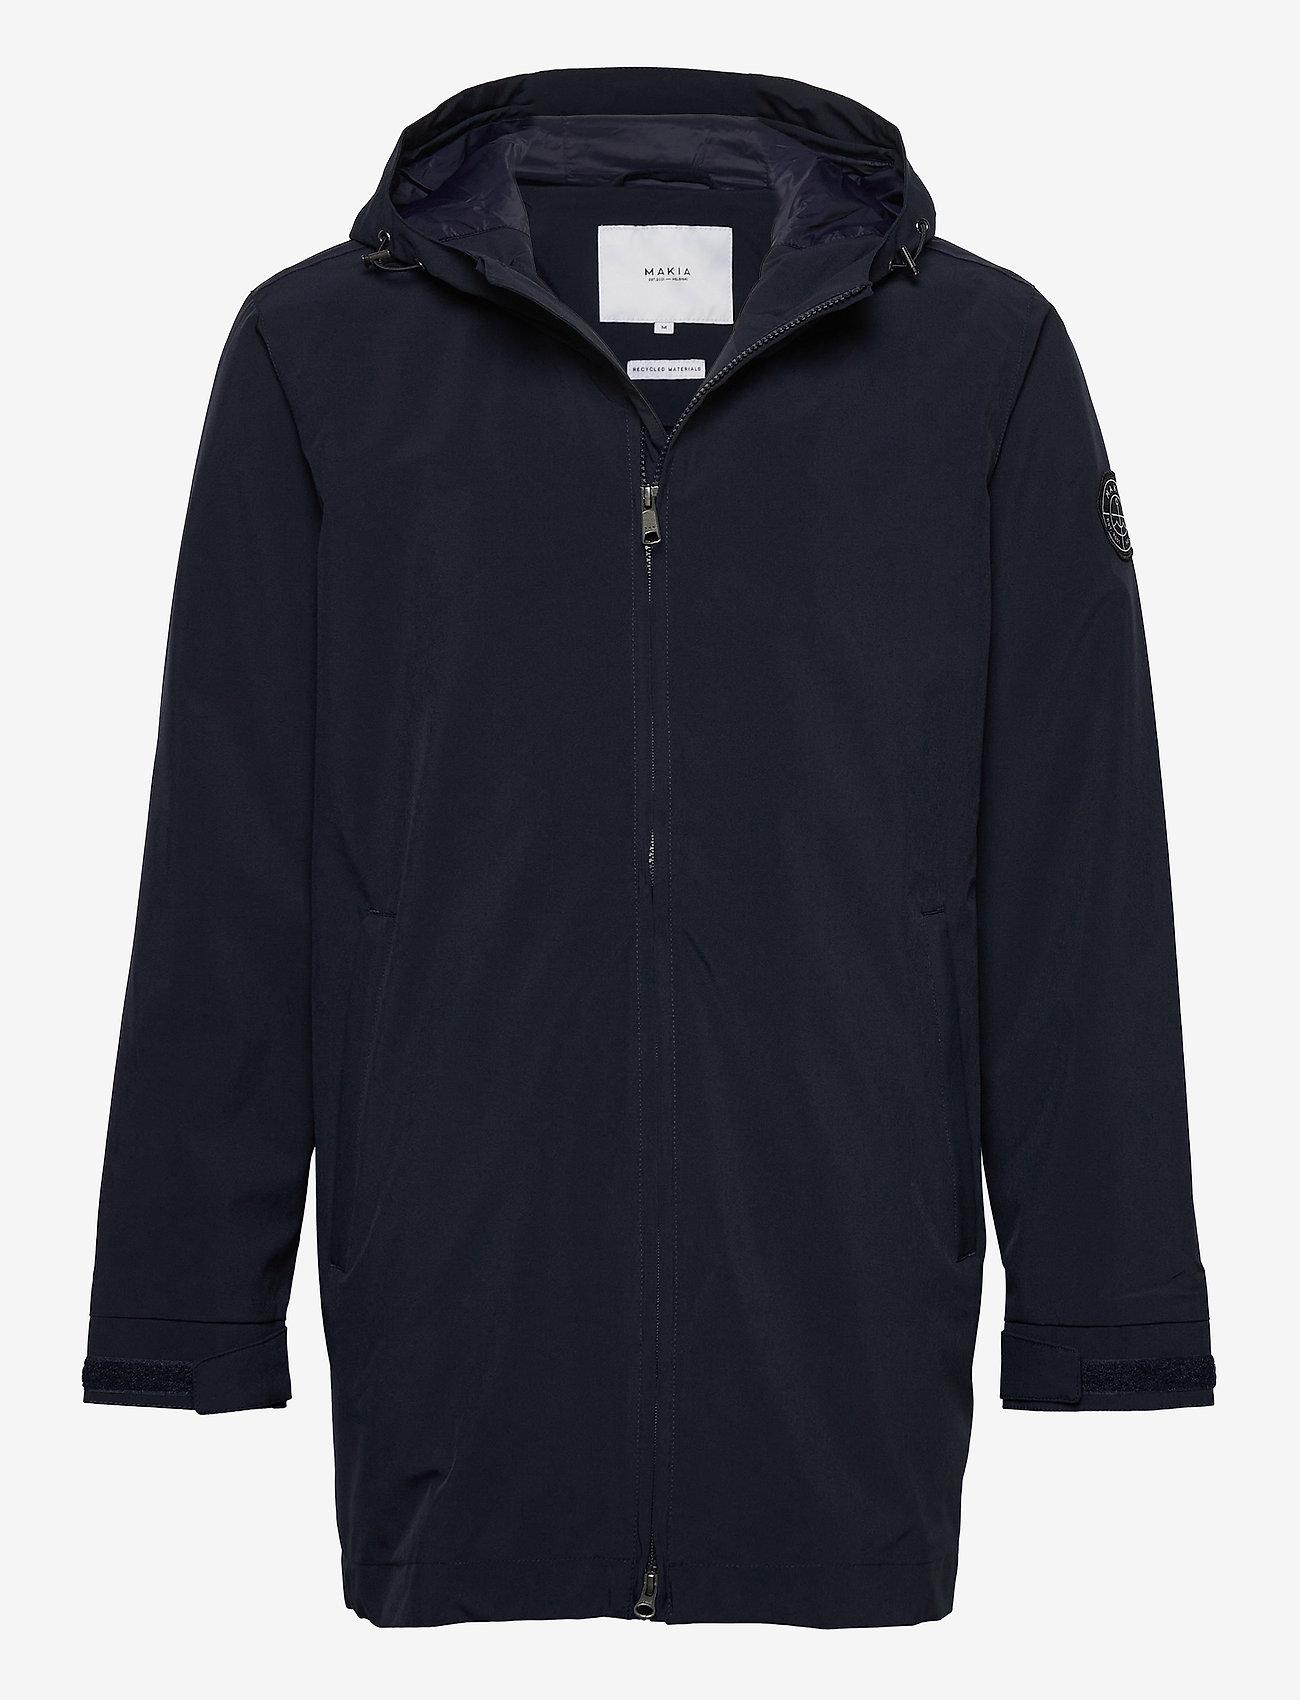 Makia - Haul Jacket - sadetakit - dark blue - 0